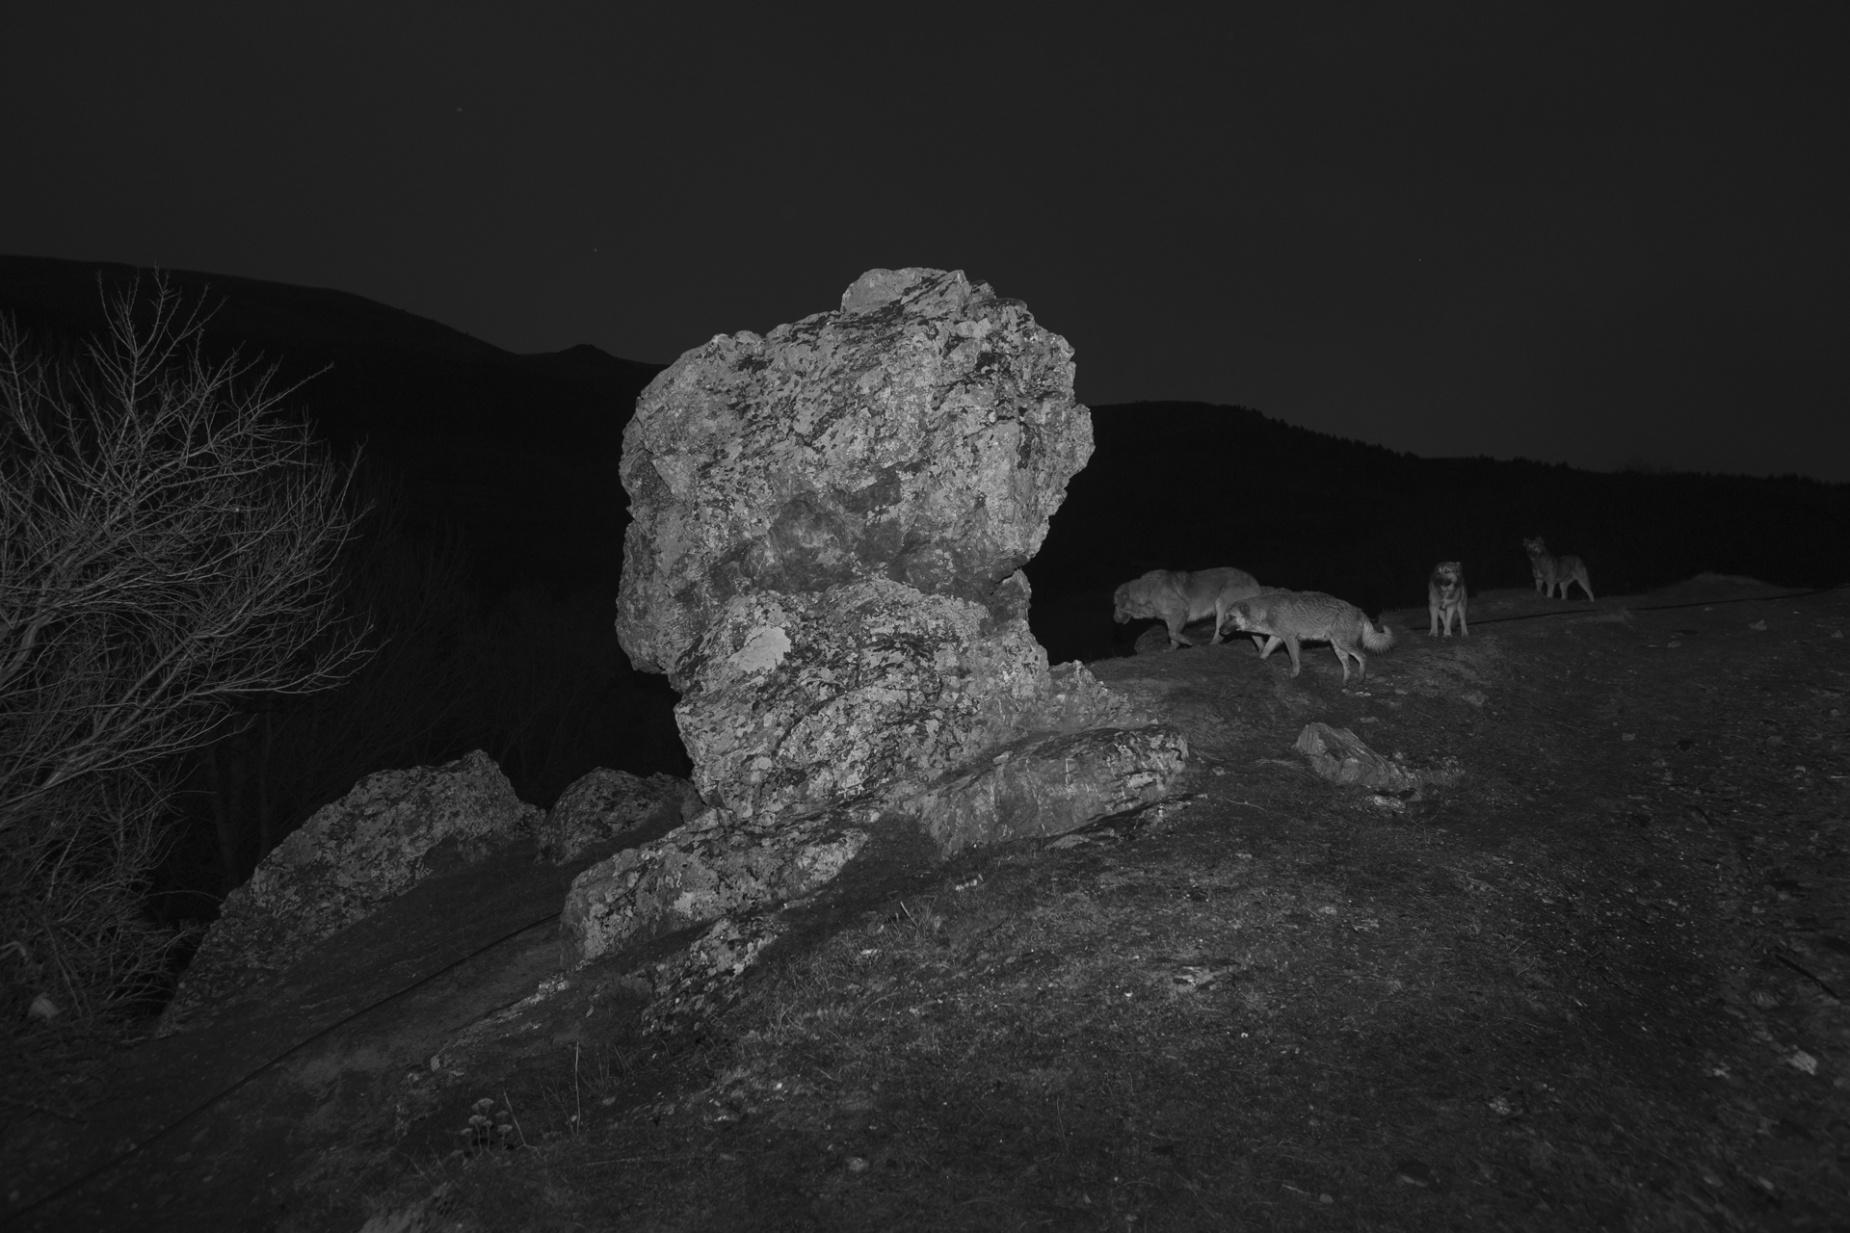 Foto geprint op Fine Art Pearl Baryta (Satin) 285gsm Papier - 40 x 60 cm of 60 x 90 cm of 90 x 135 cm